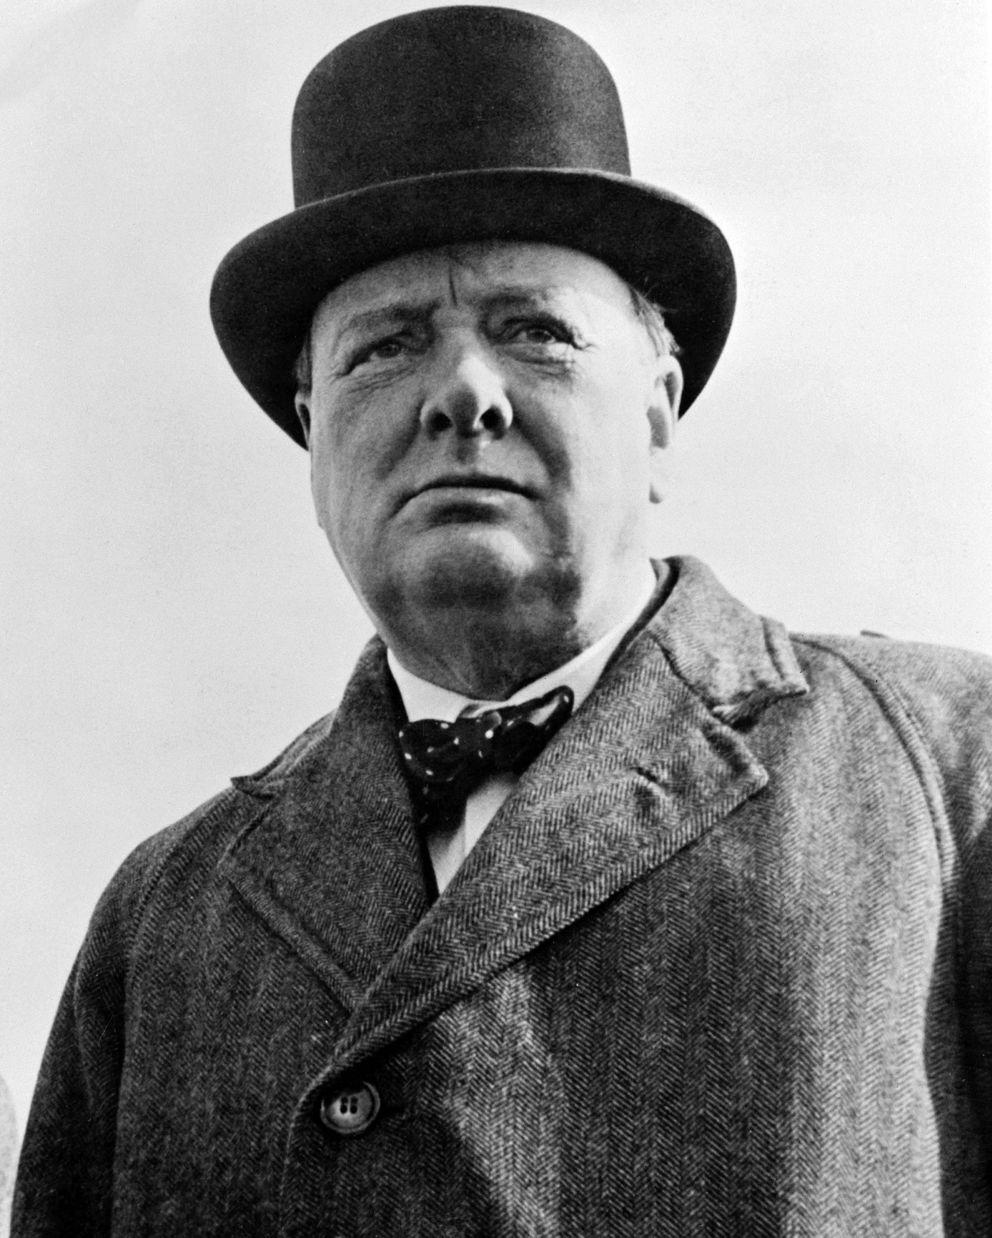 Sir Winston Churchill in 1942 (U.S. Library of Congress)